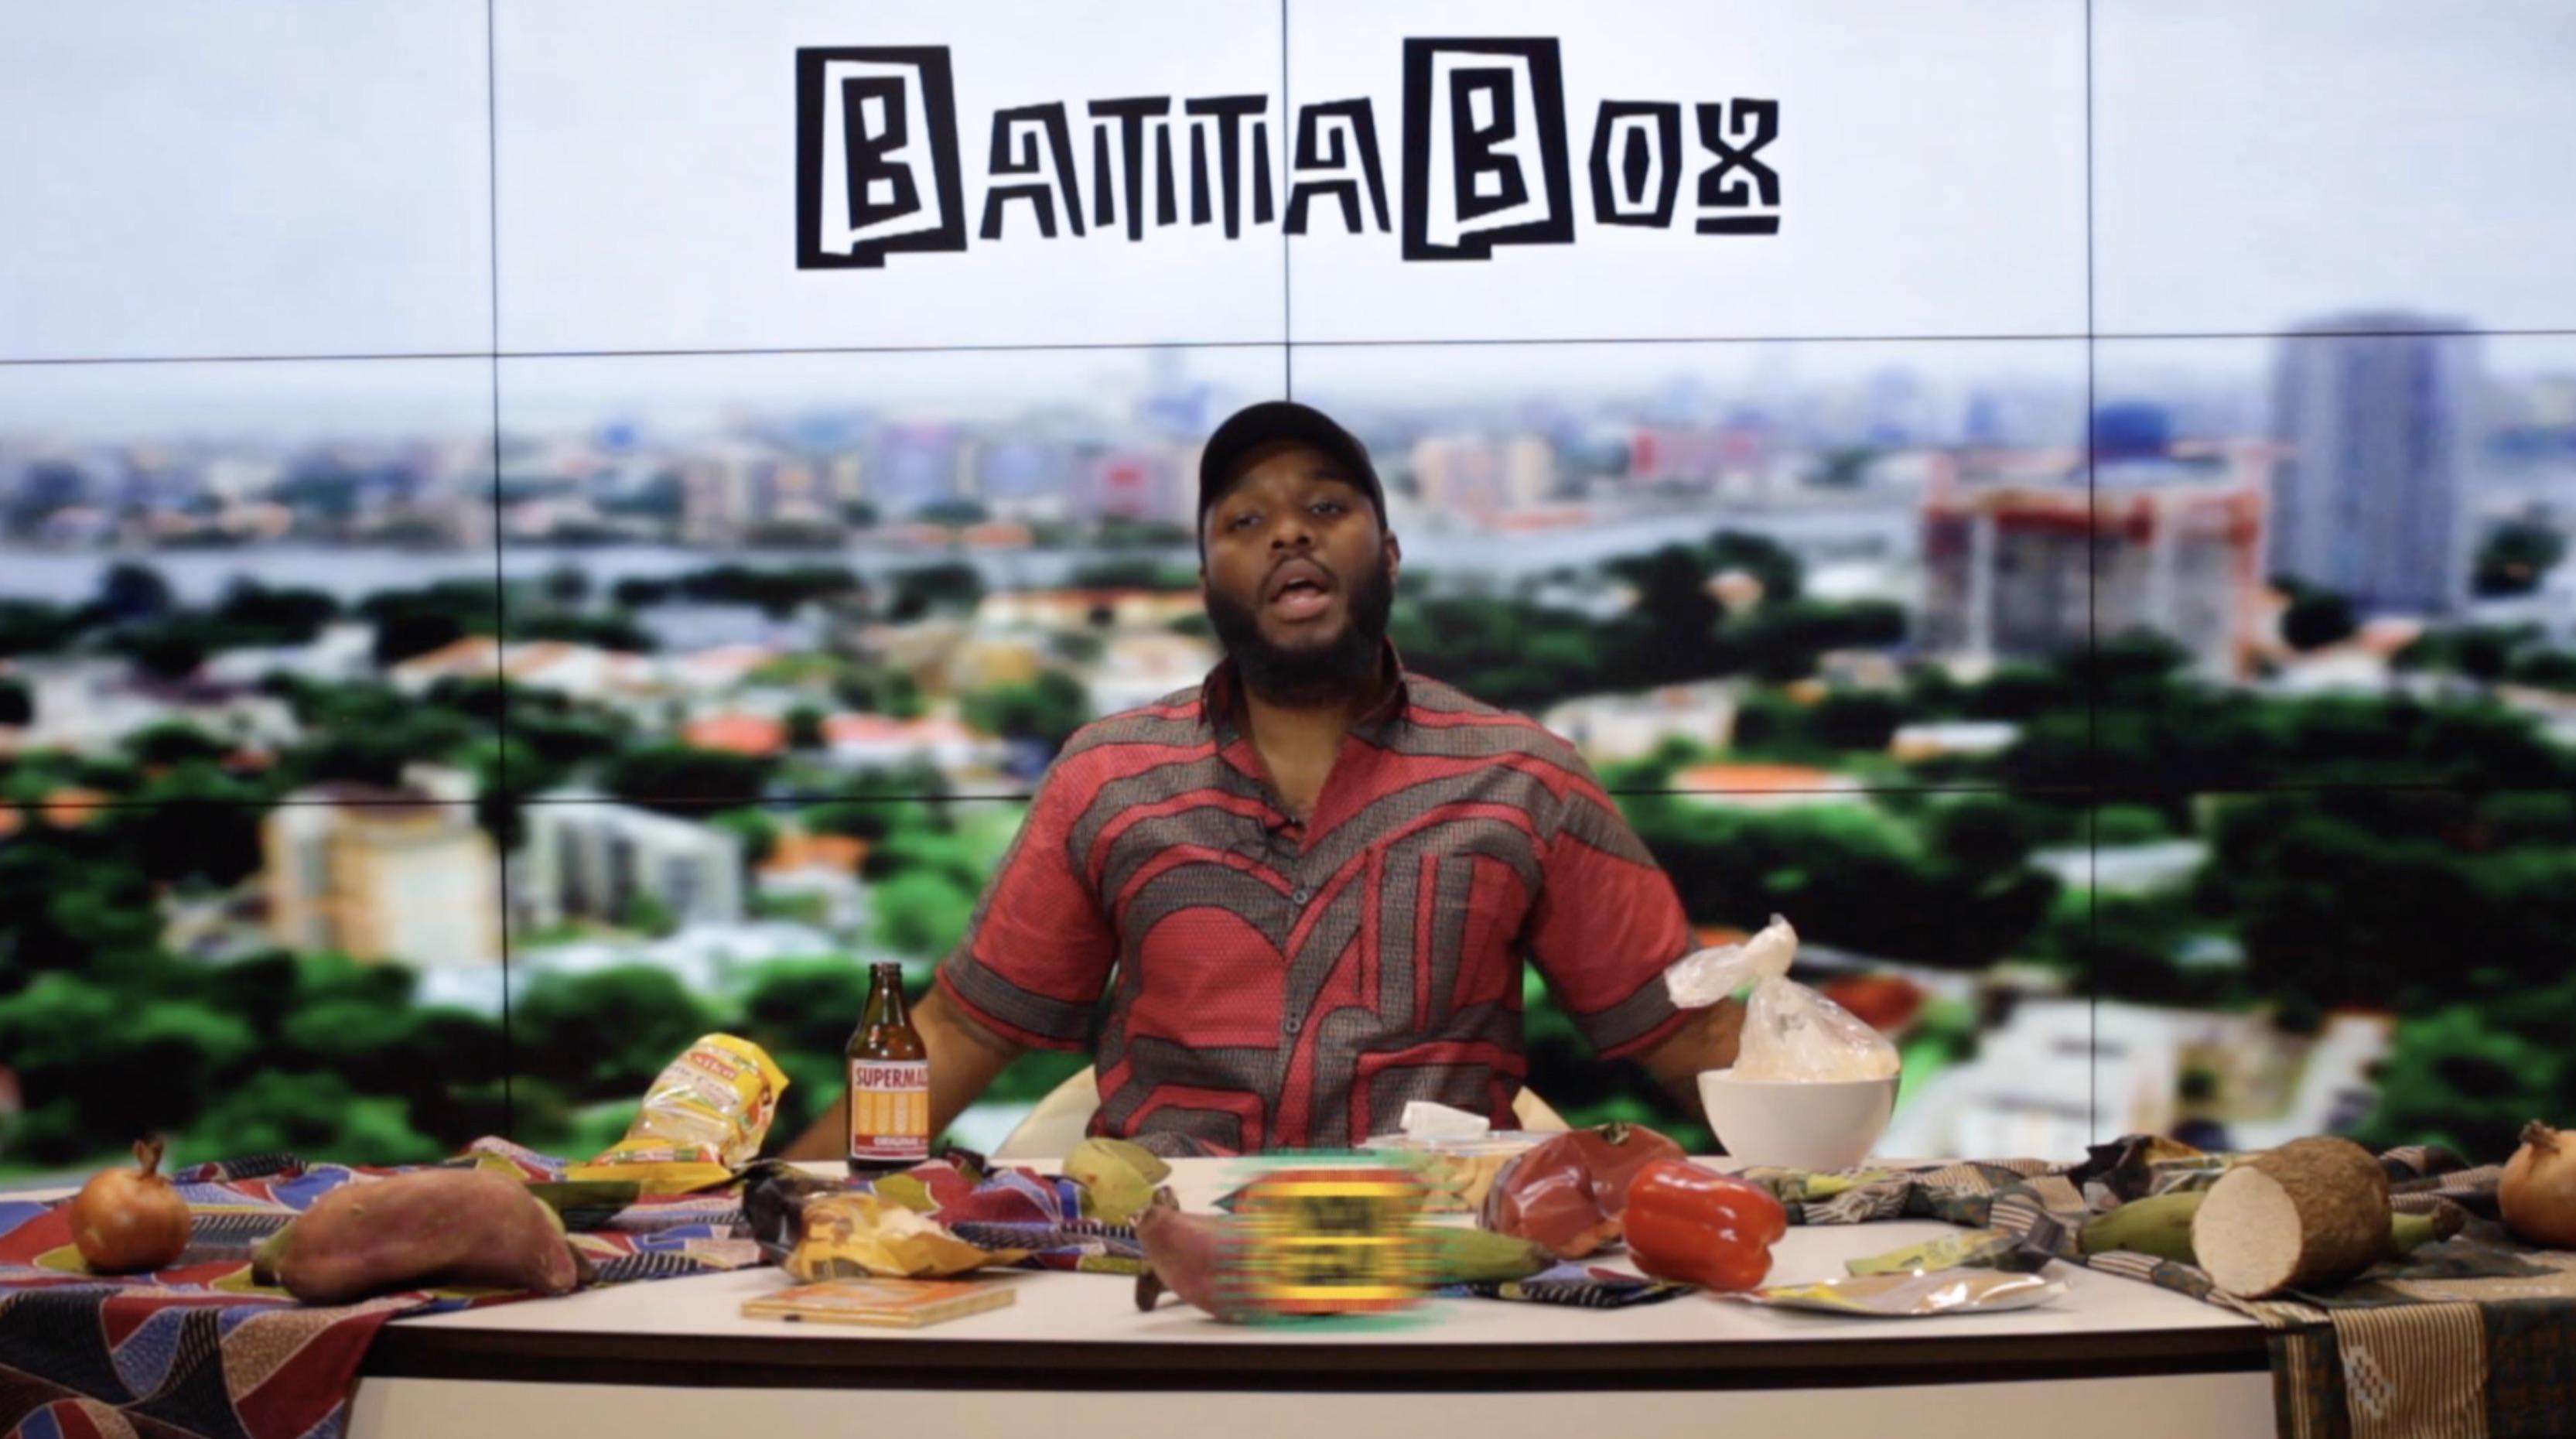 Battabox